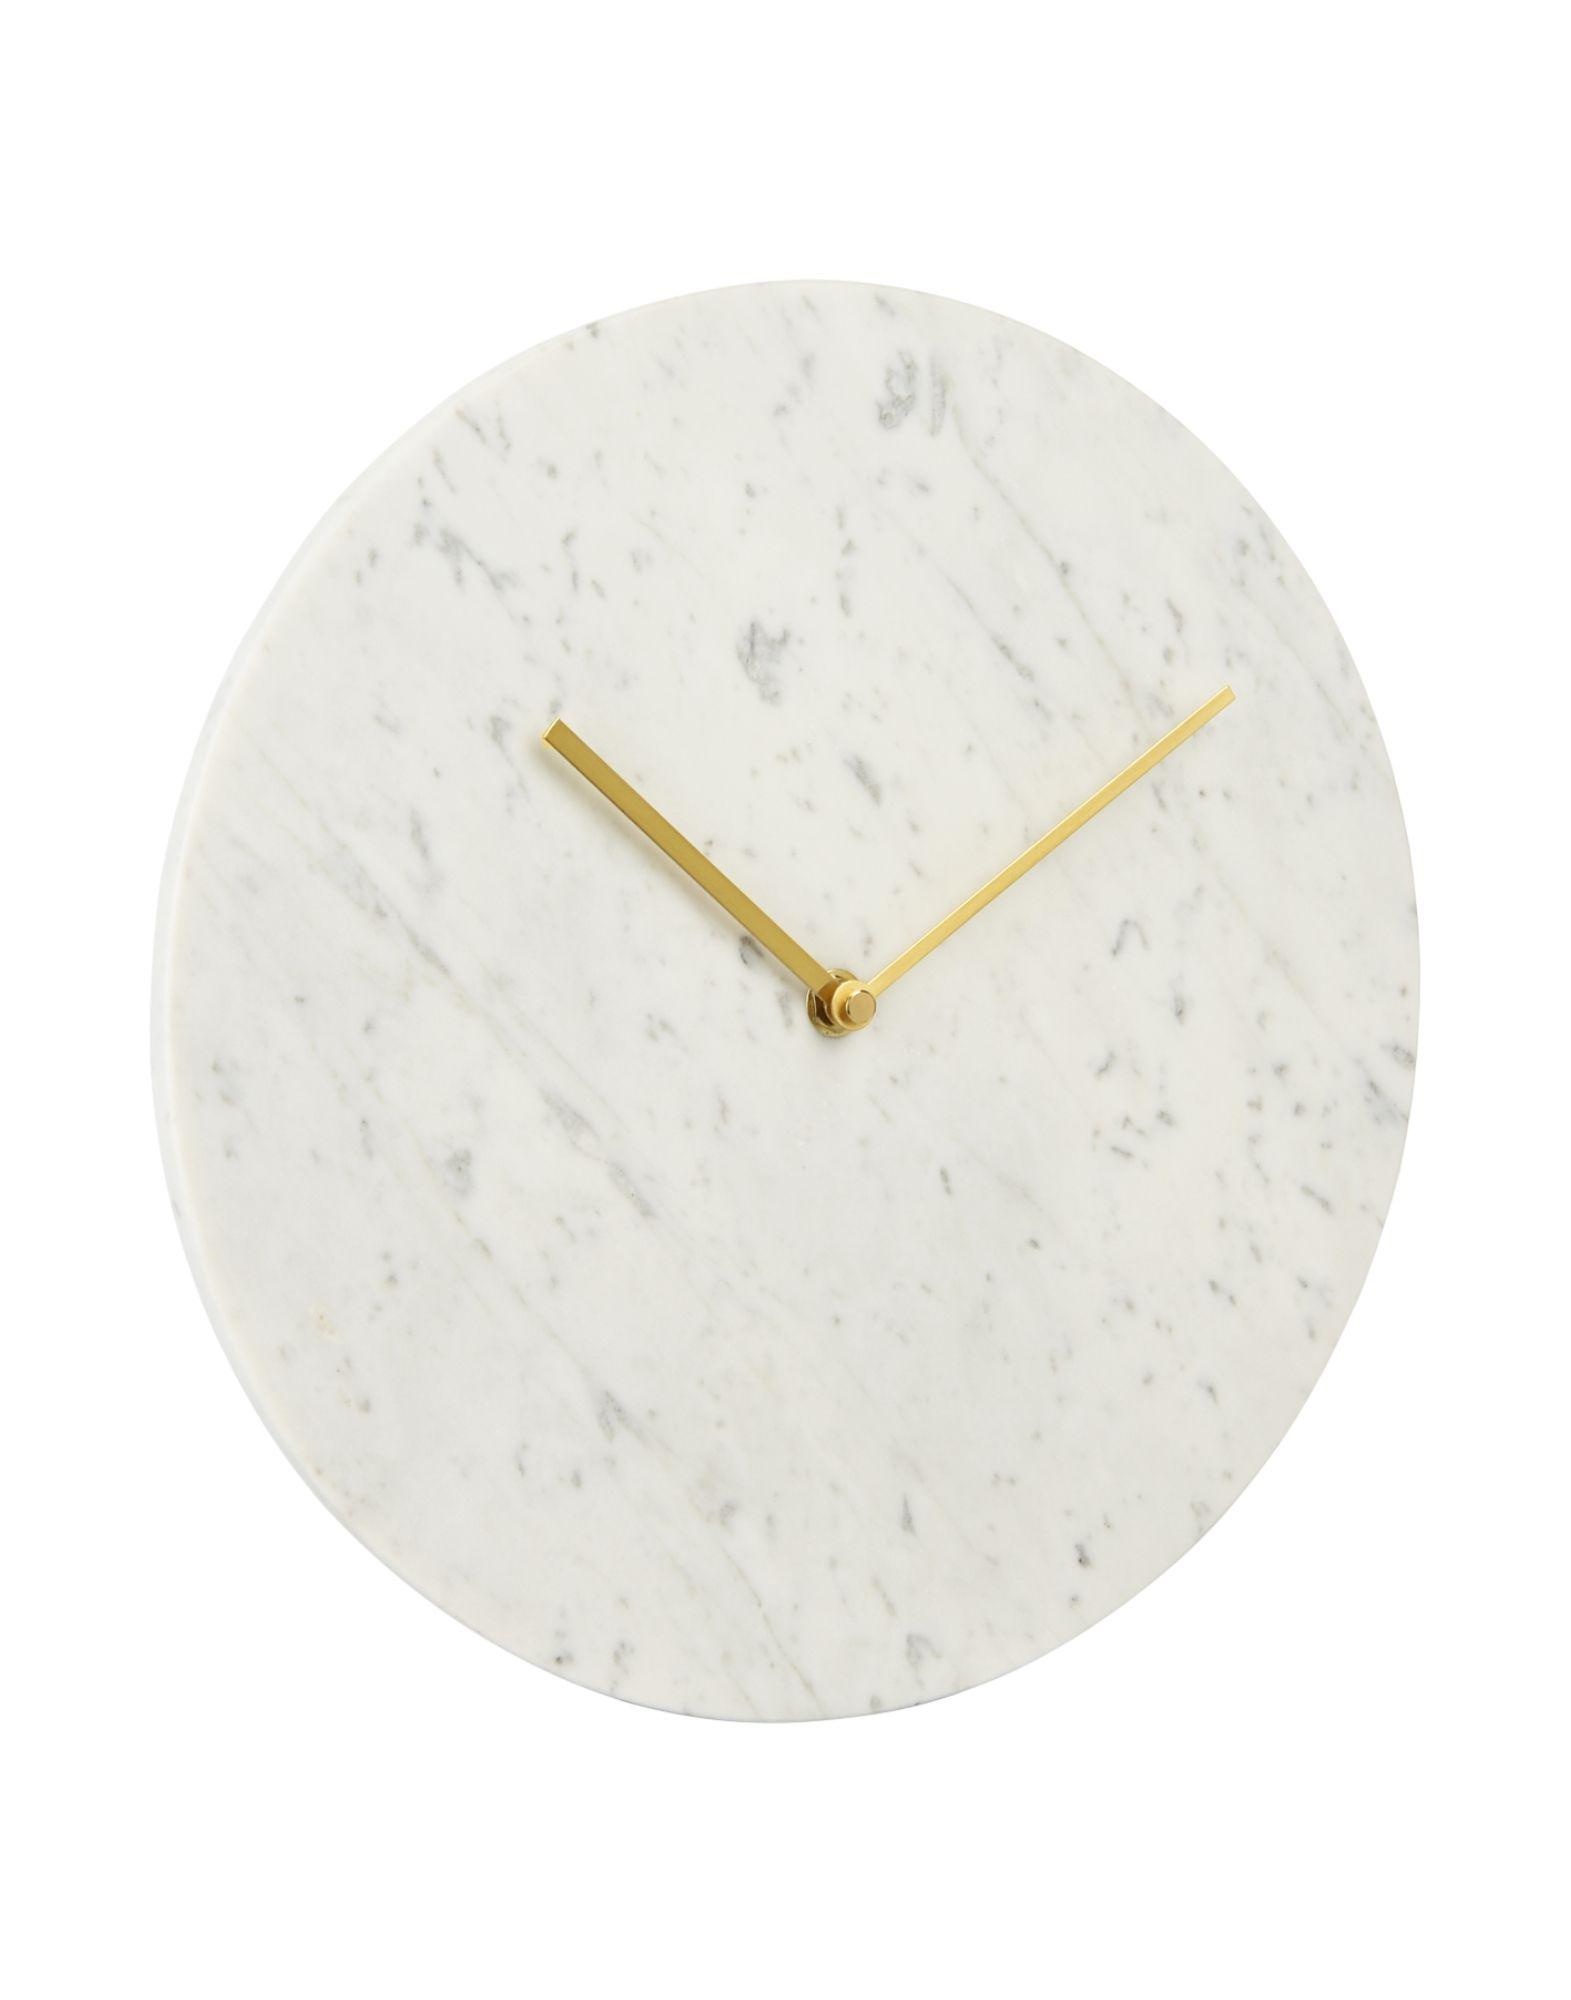 MENU Настенные часы брелок denmark menu menu